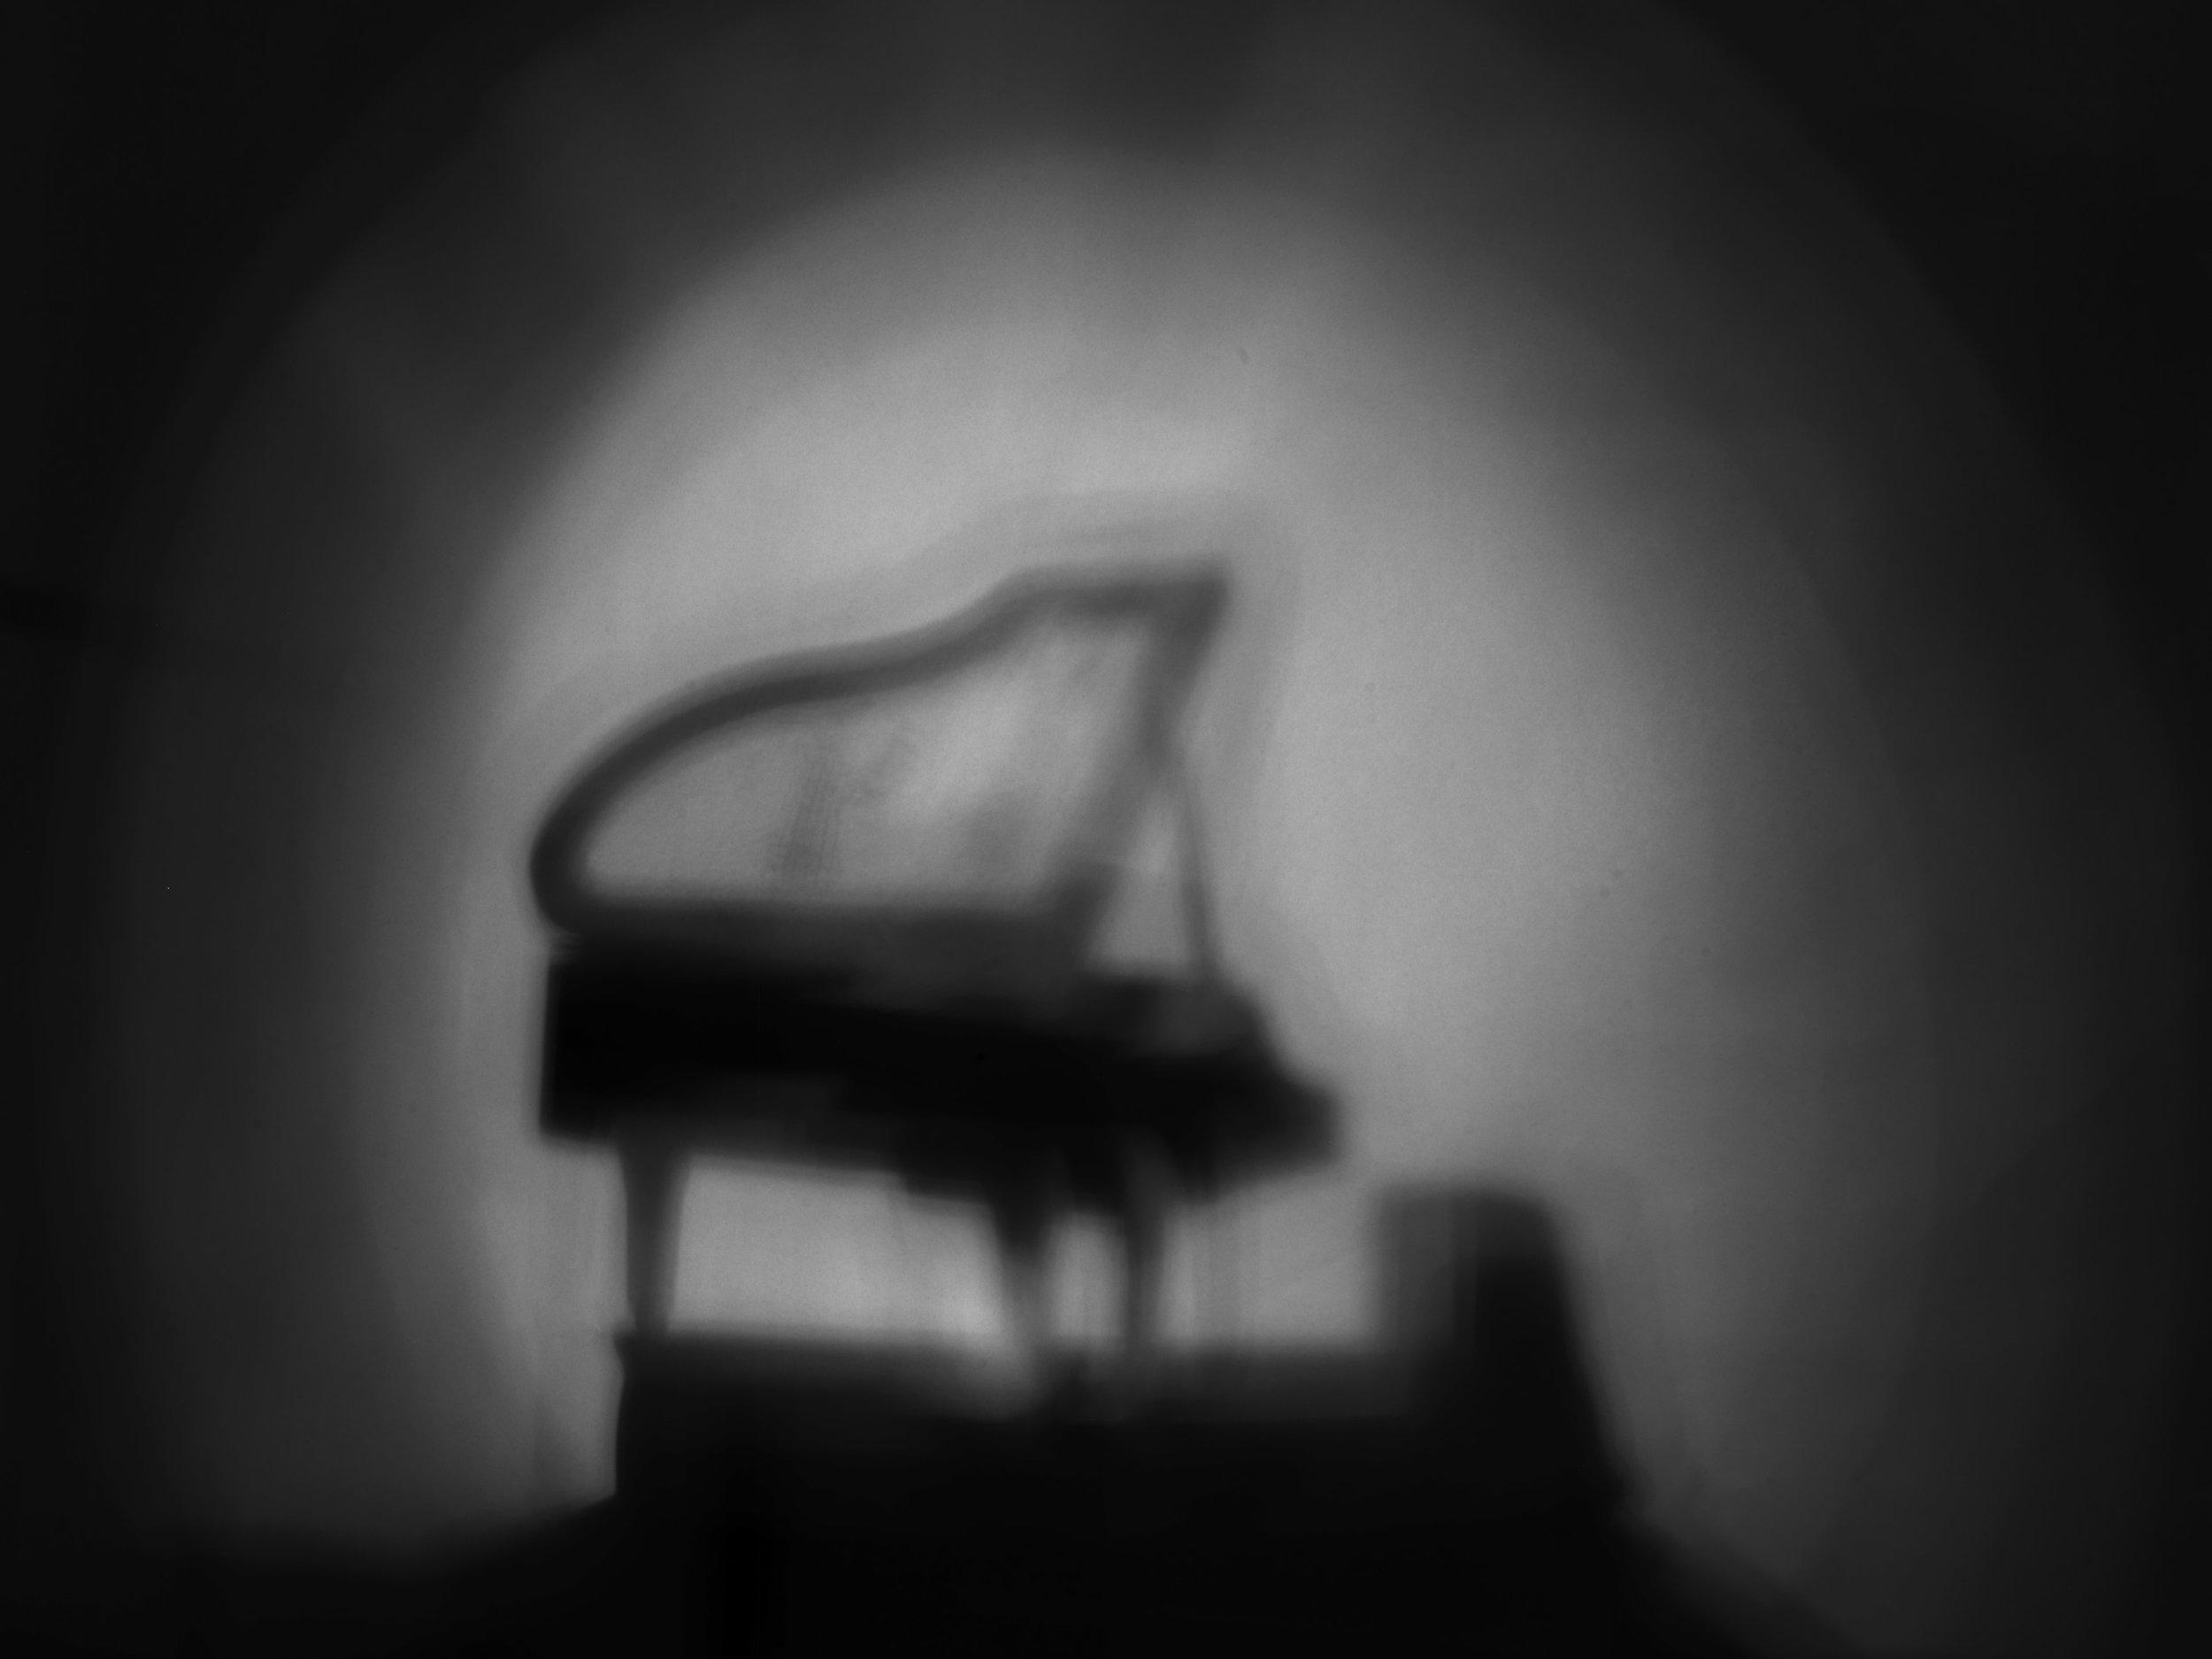 Lightand Shadow in the Future-QEP FINE ART 2018-Piano-Marco Garofalo-Fine Art Photography-2018.jpg